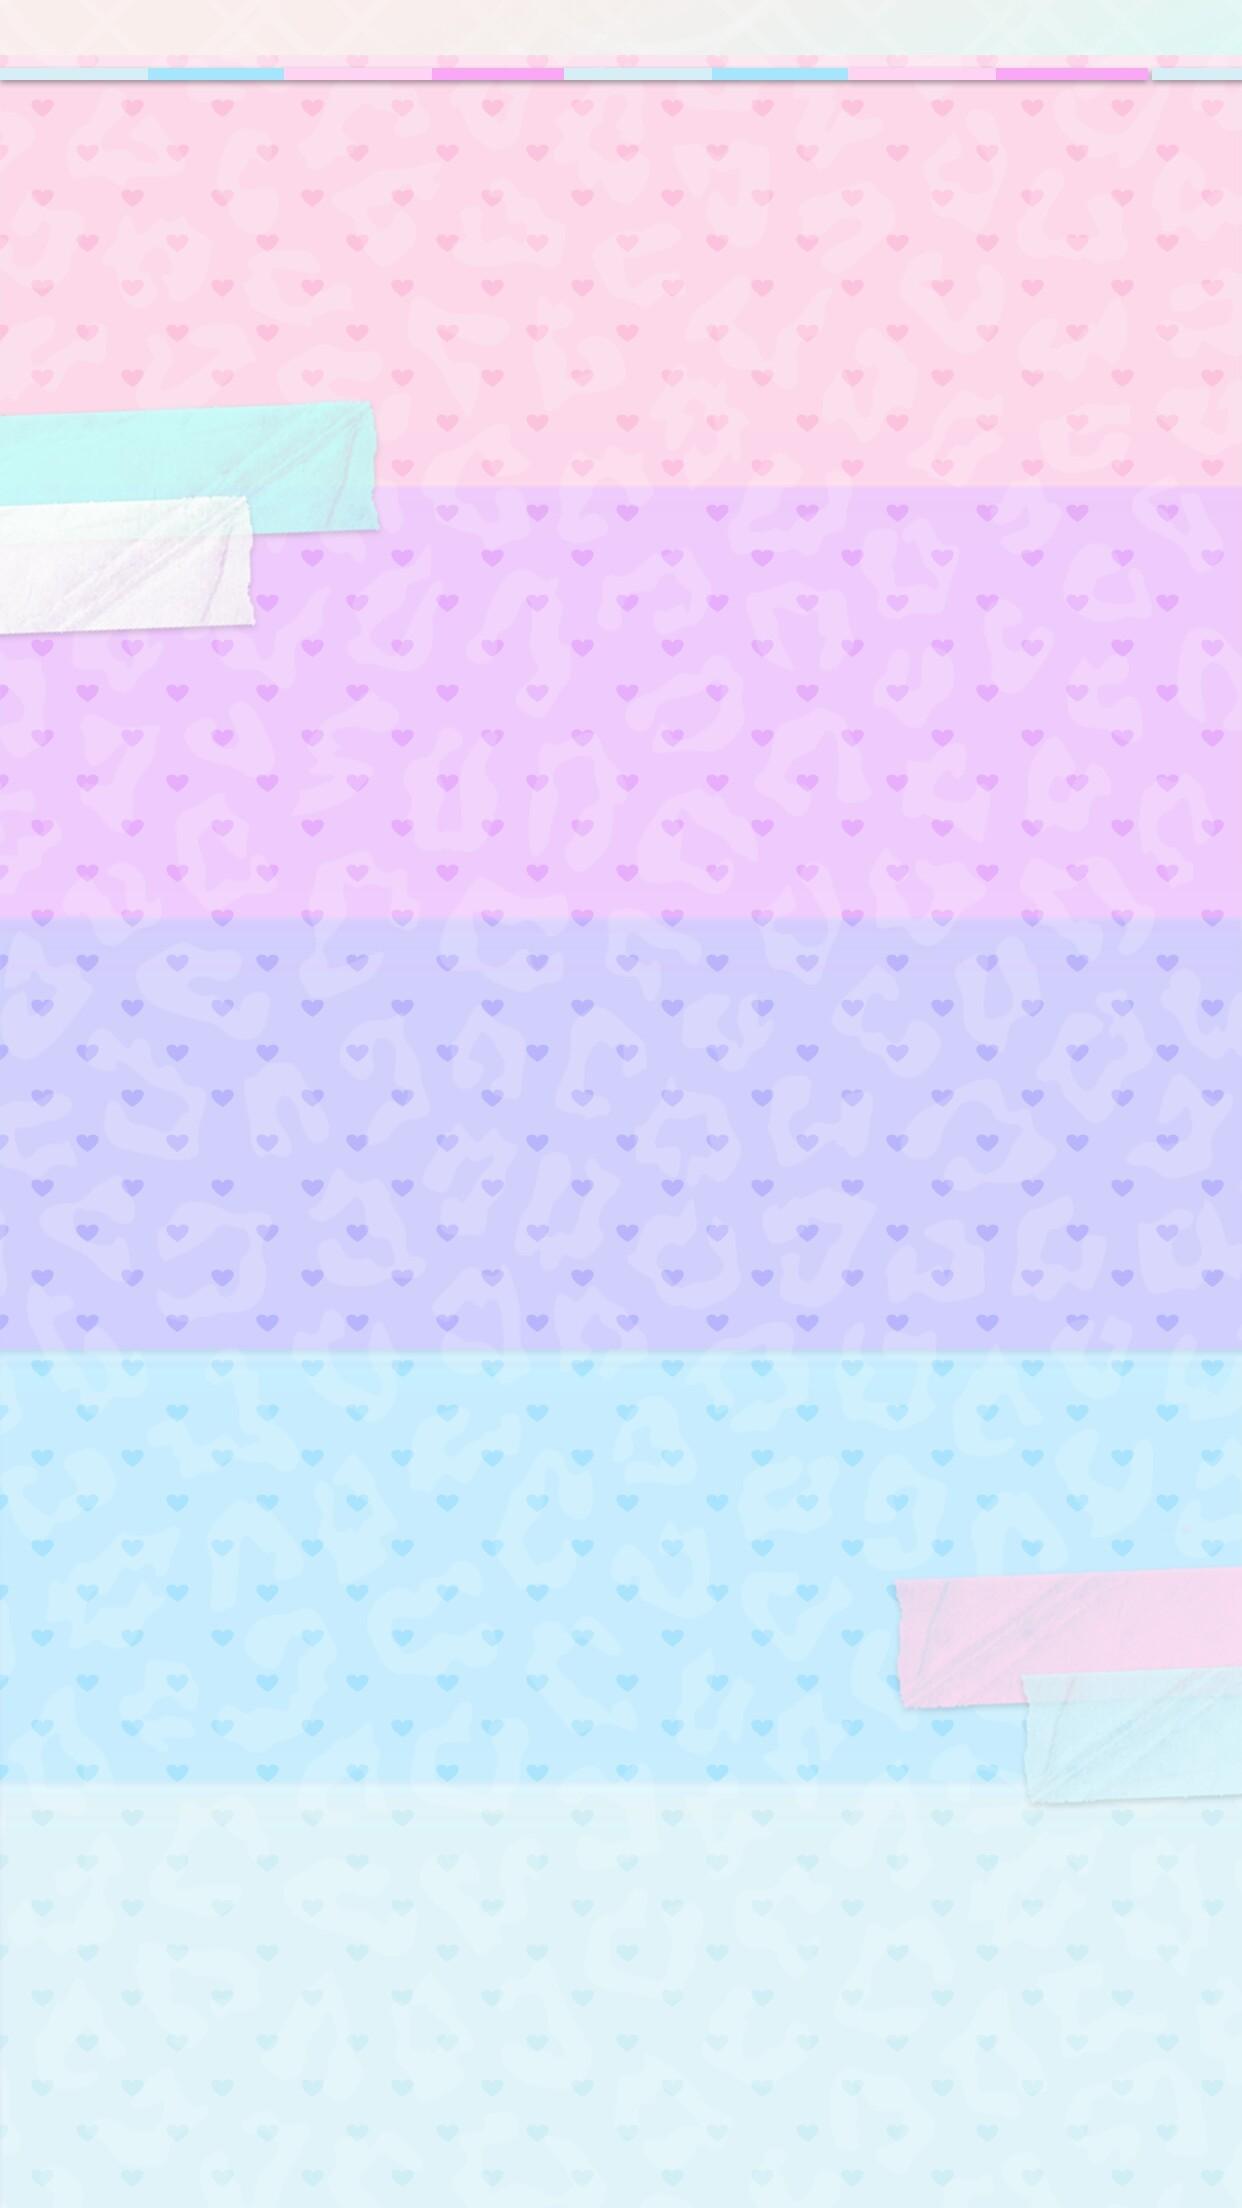 Pastel Wallpaper Ipod Wallpaper Wallpaper Backgrounds Background Pastel Iphone 1242x2208 Wallpaper Teahub Io